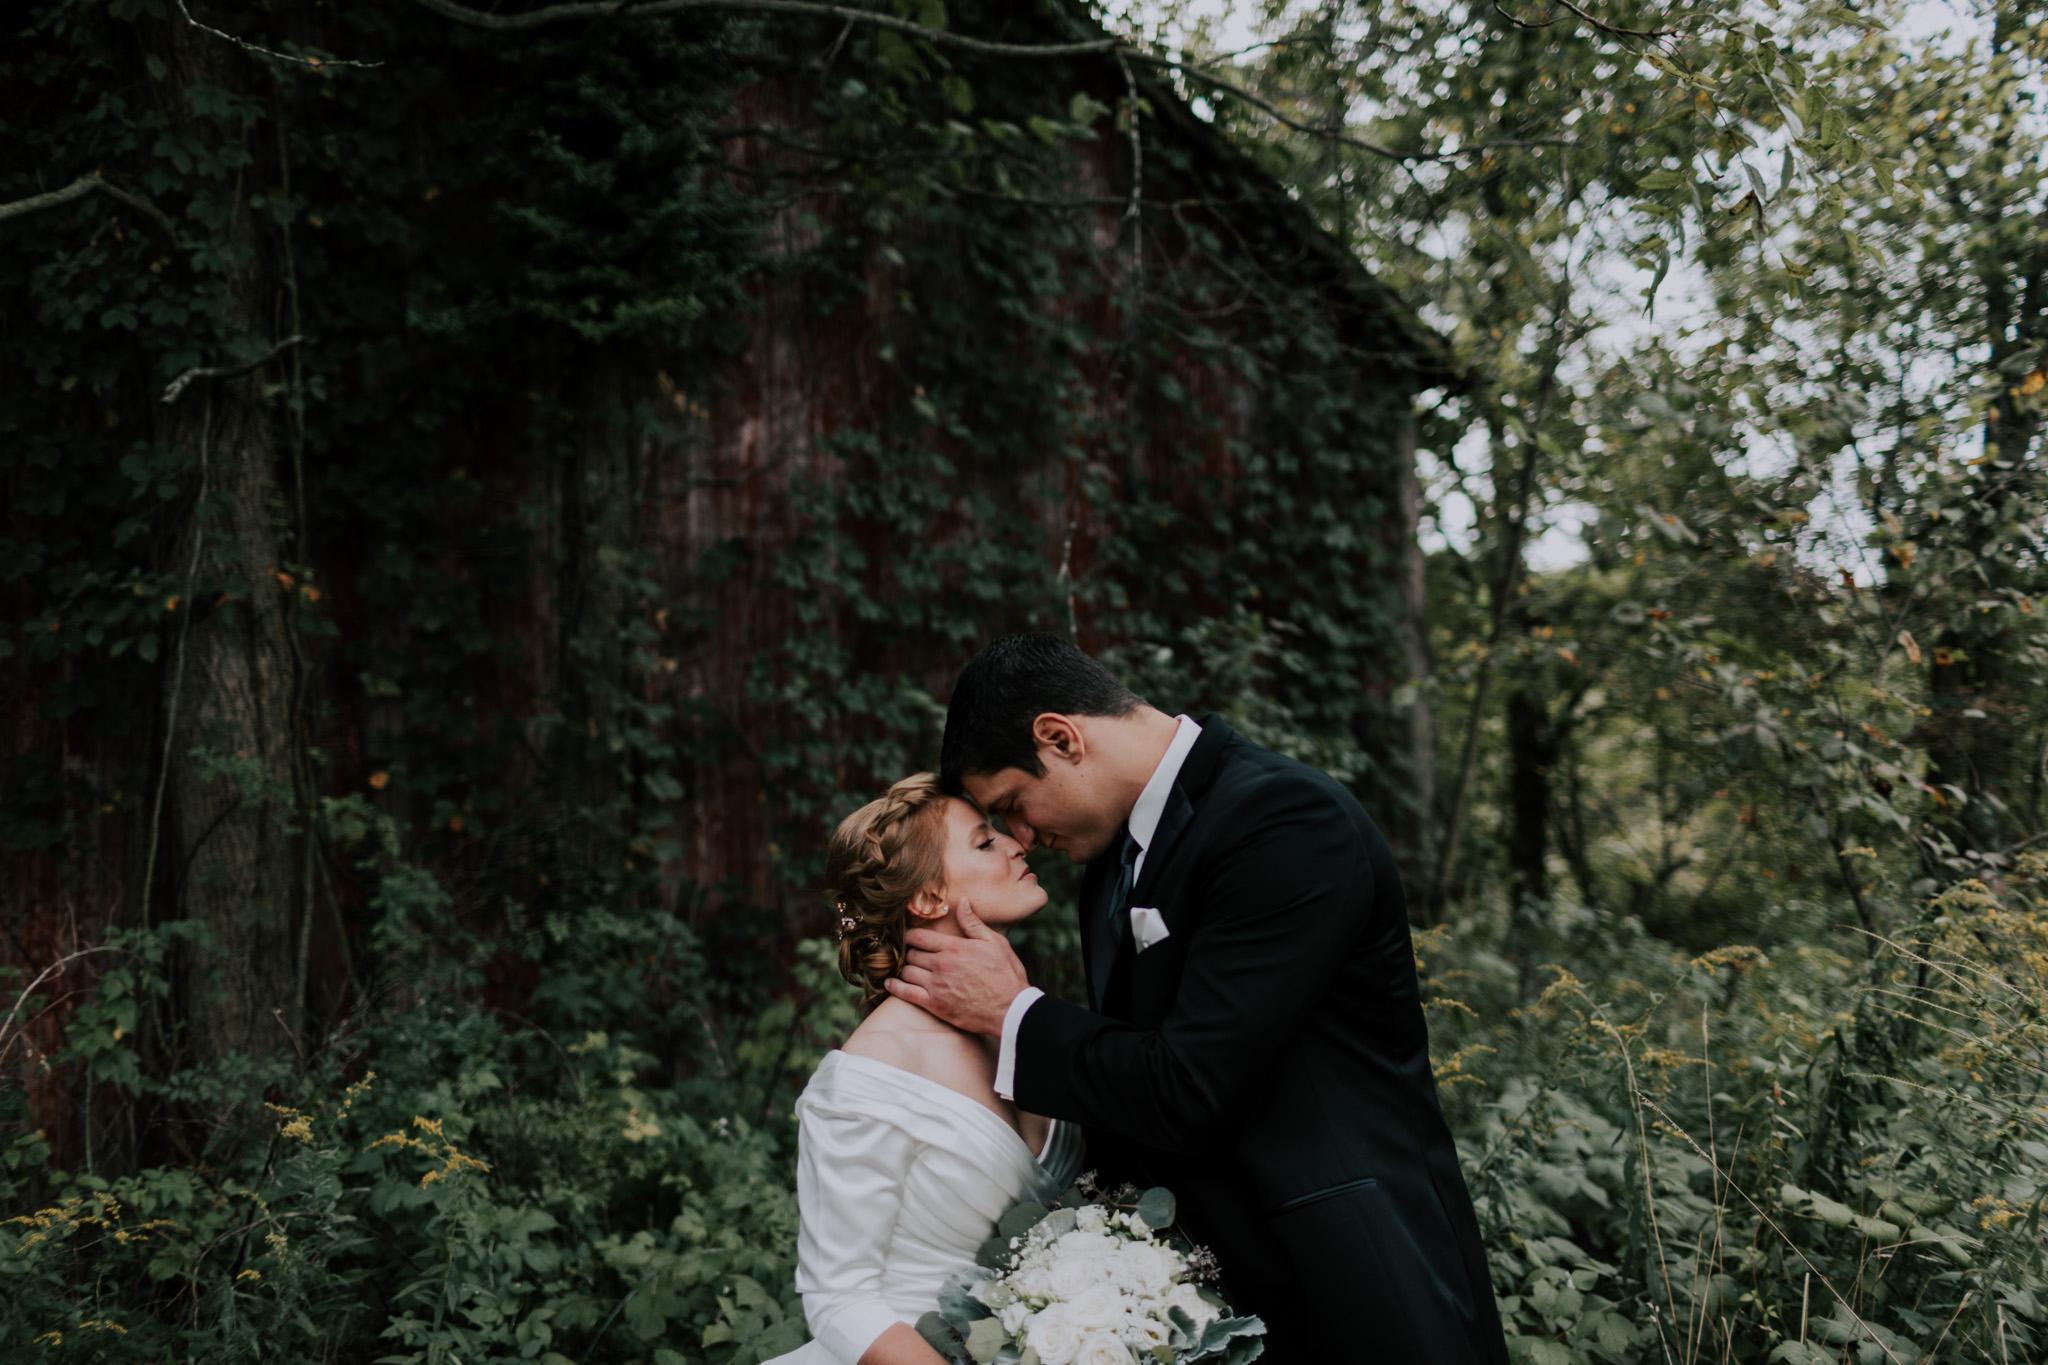 MillCreek-Wilde-Wedding-Barn-Michigan-Eliza-Eric-Vafa-Photo444.jpg